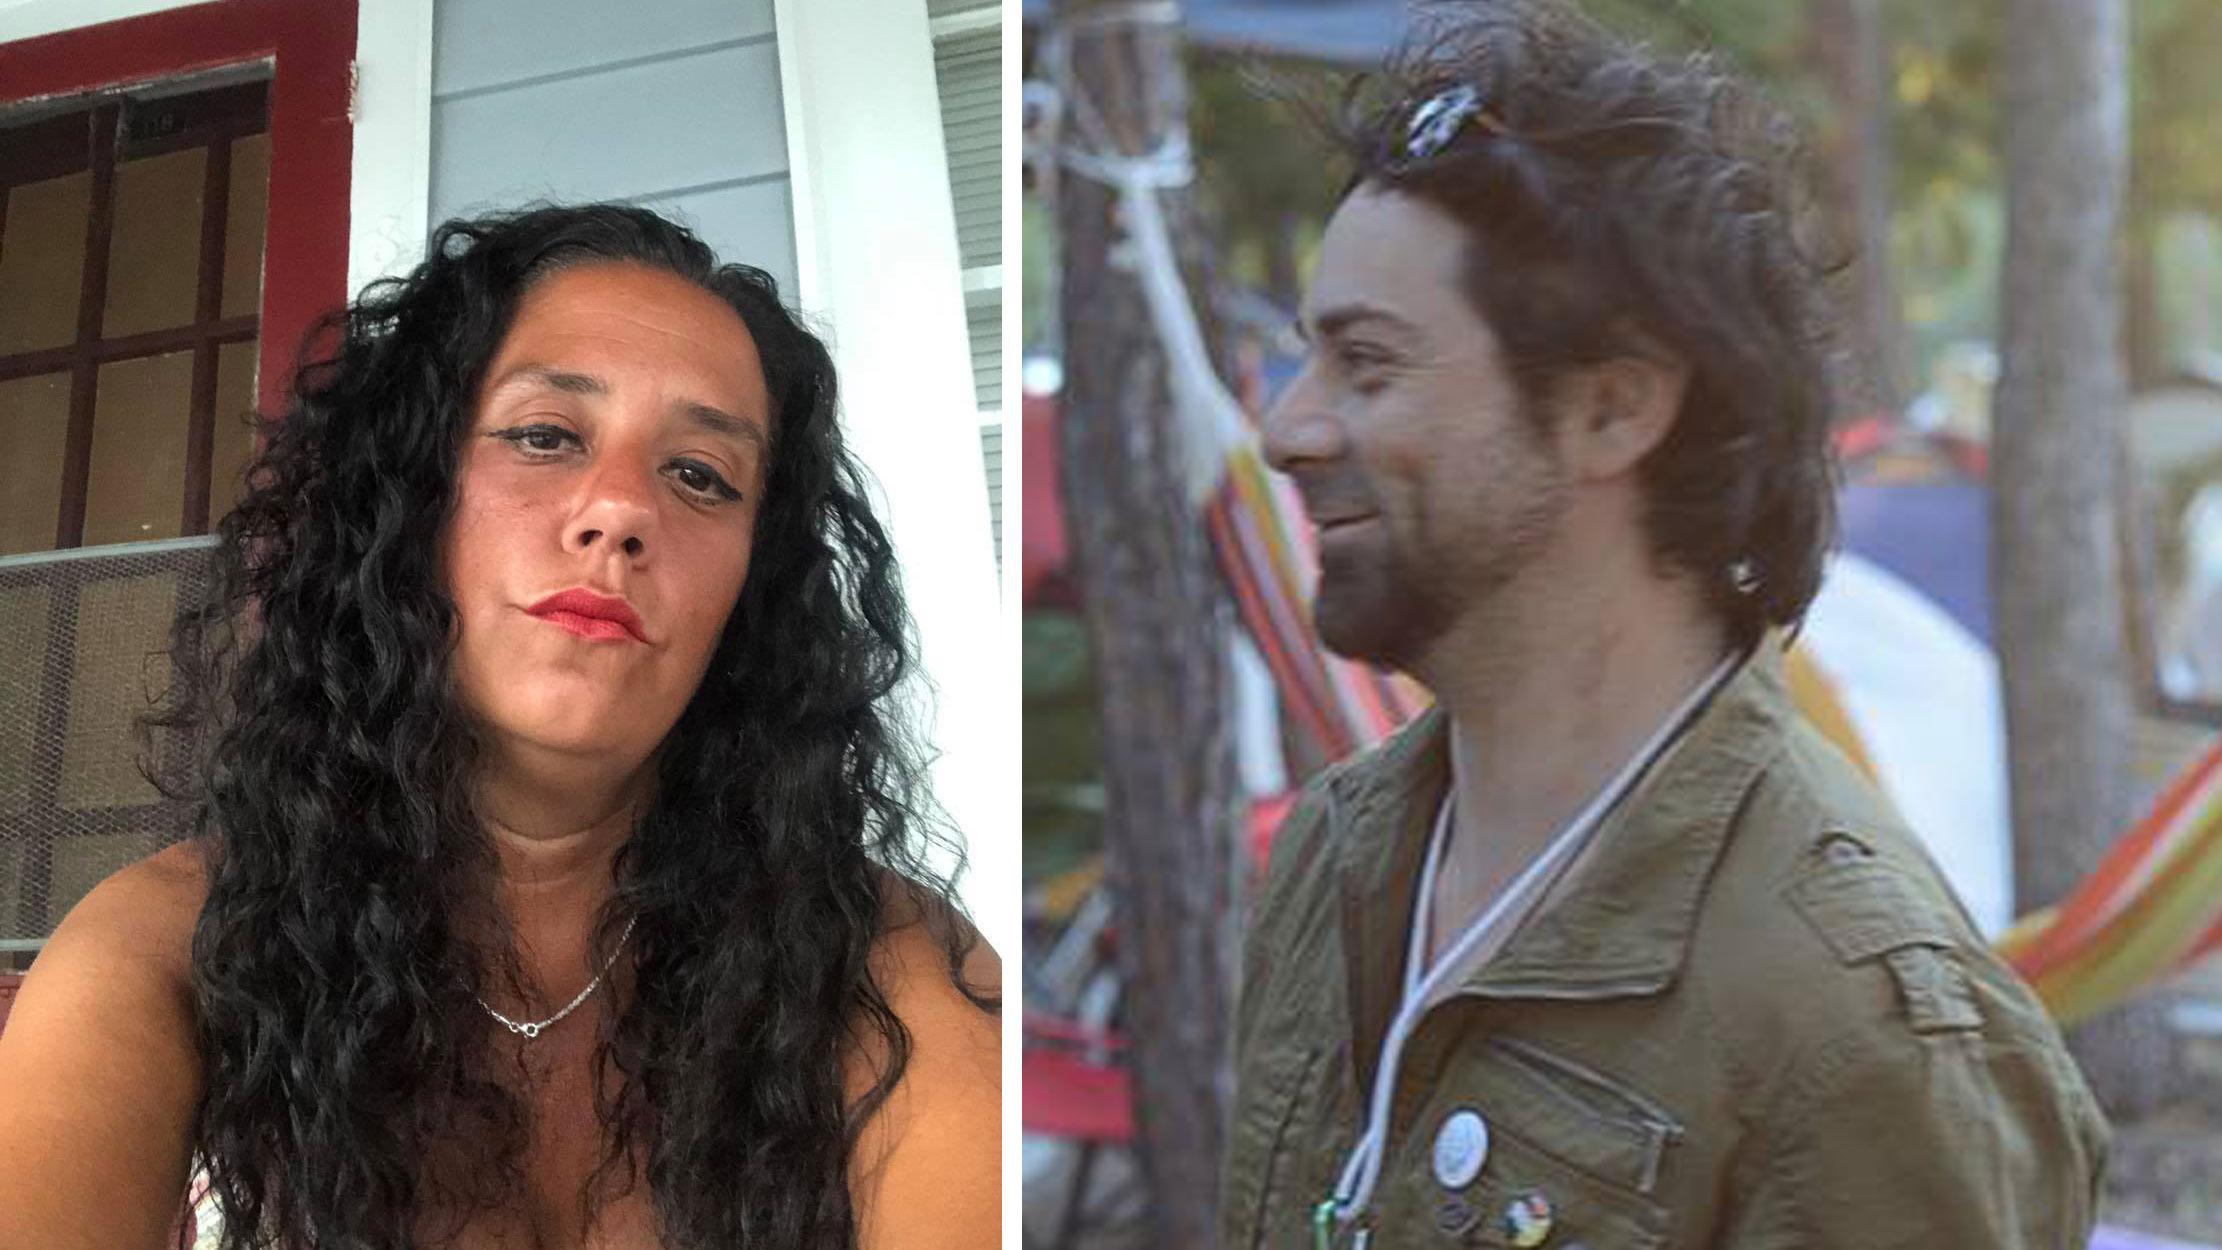 Кристи Поттс / Джесси Зепеда. Фото ©facebook.com/Kristi Potts /Jassey Zapeda